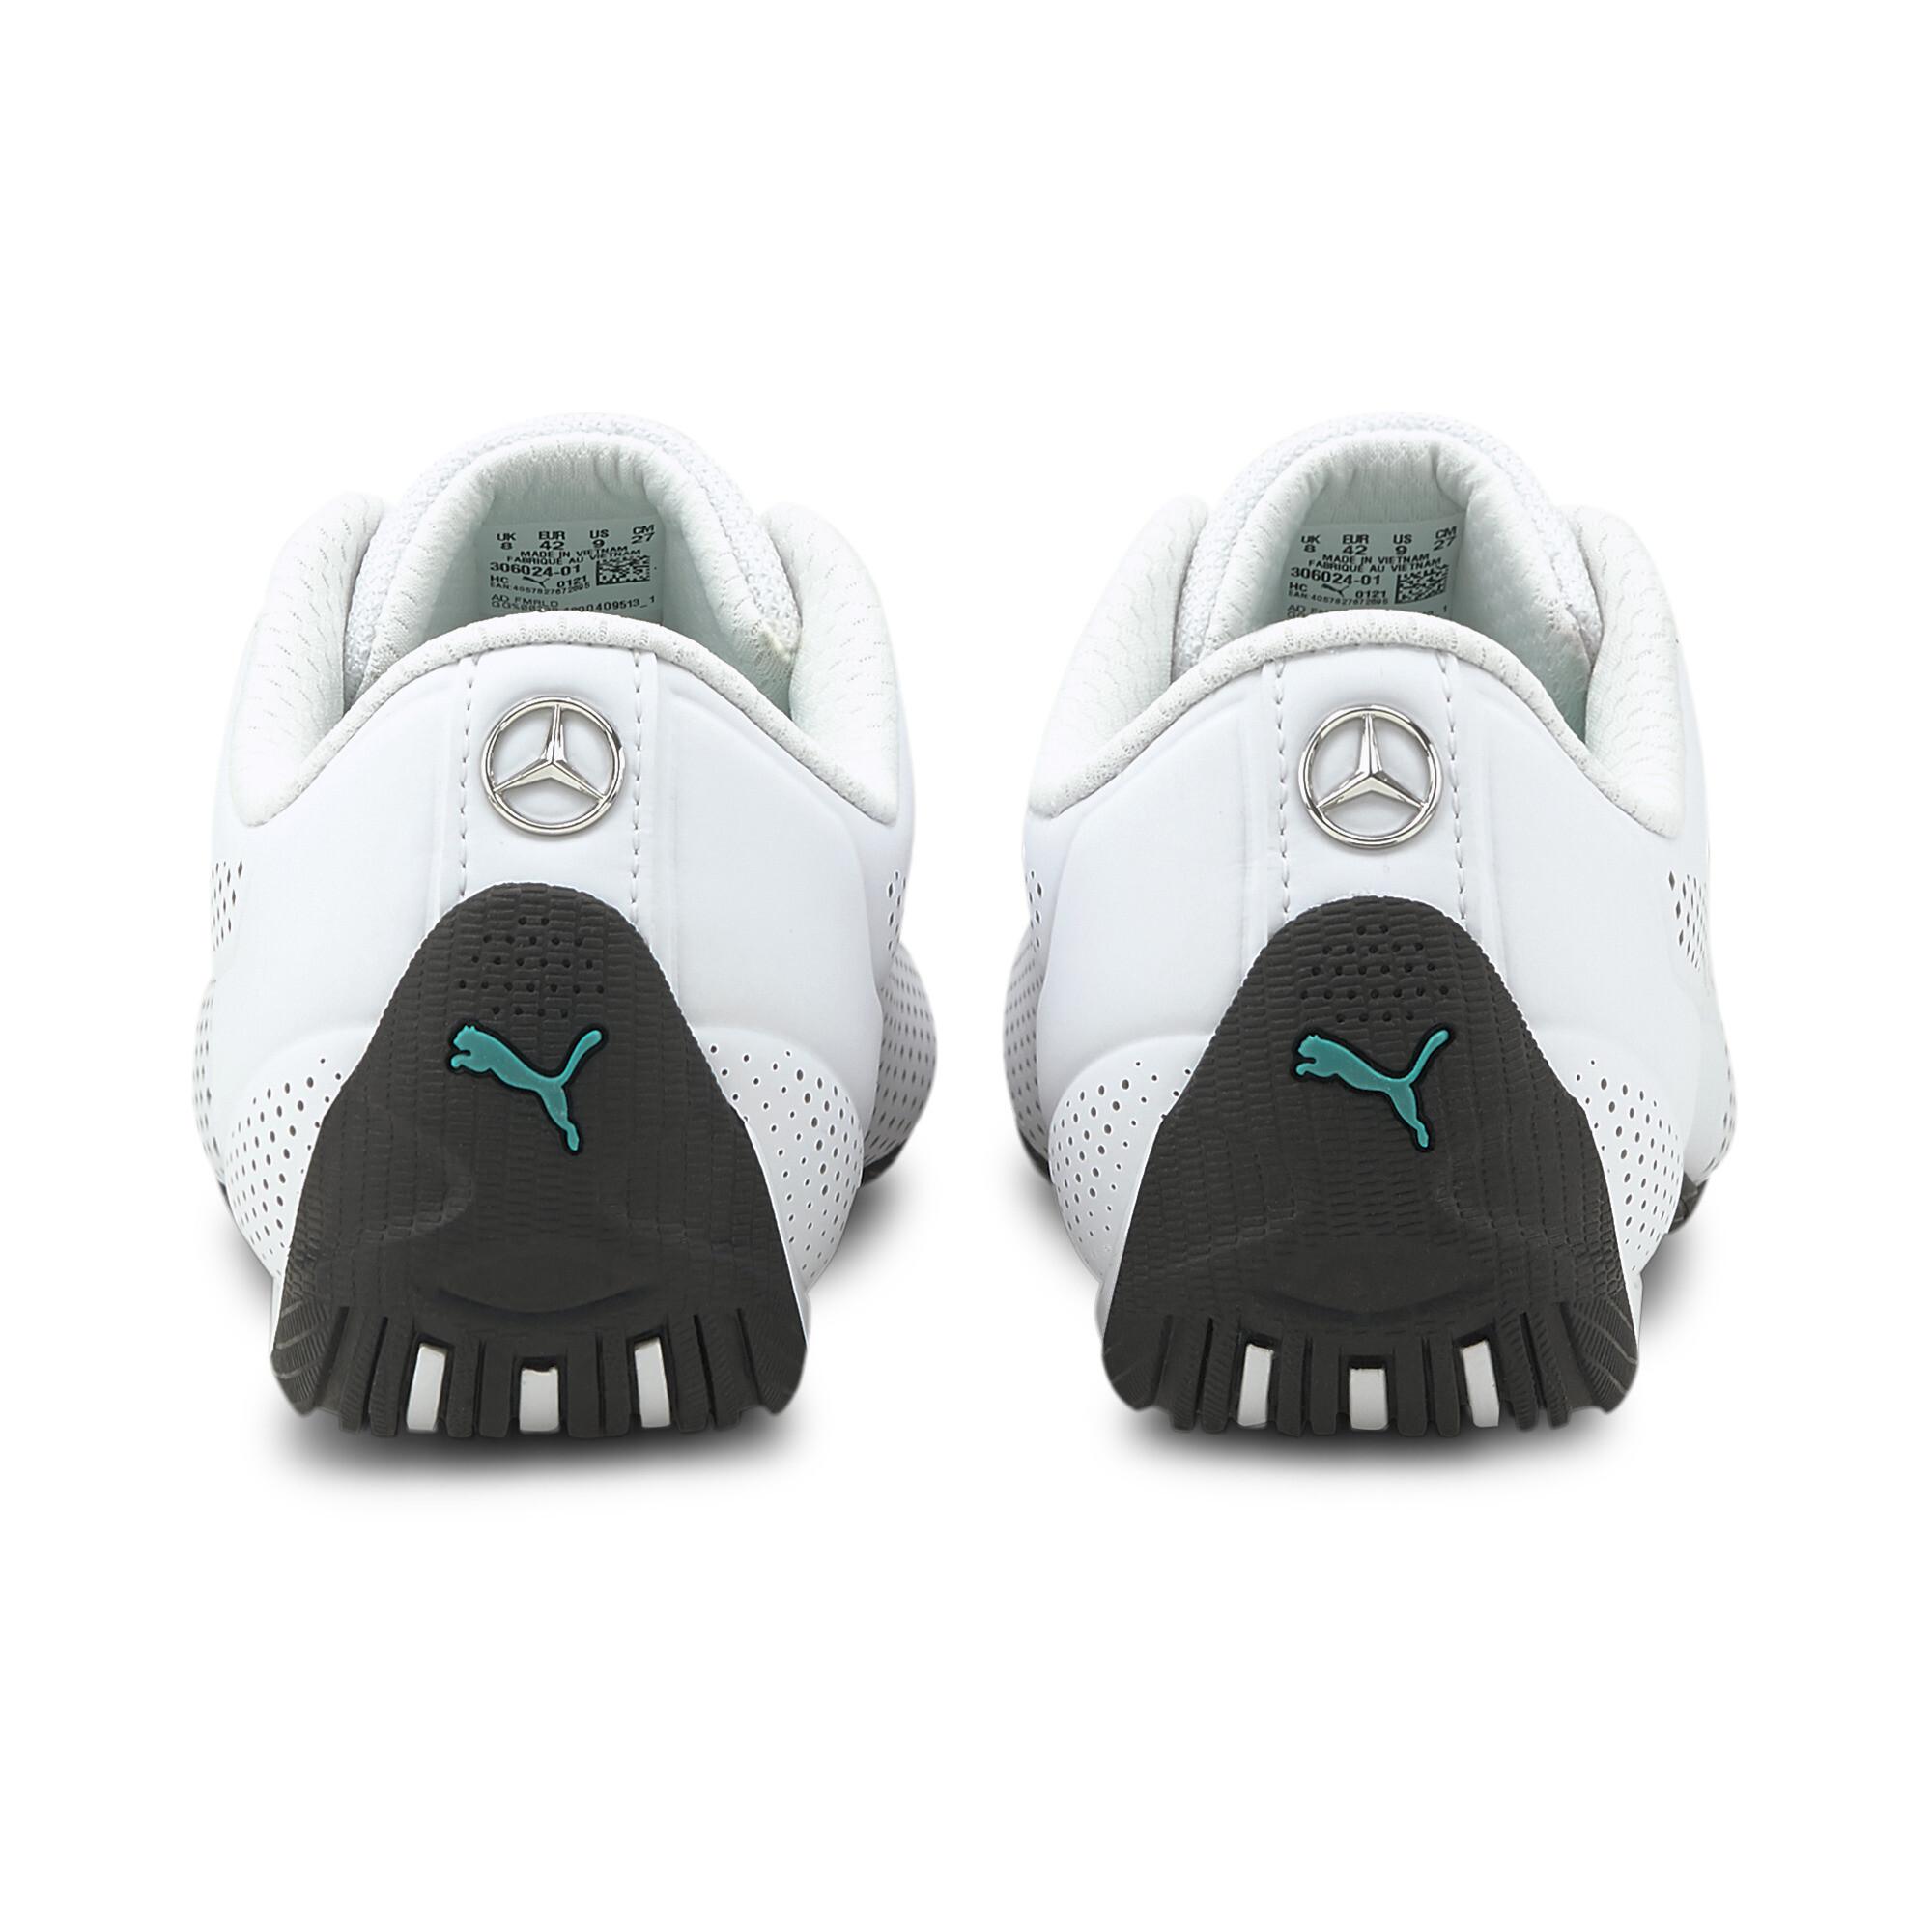 PUMA-MERCEDES-AMG-PETRONAS-Drift-Cat-Ultra-Sneaker-Unisex-Schuhe-Neu Indexbild 15